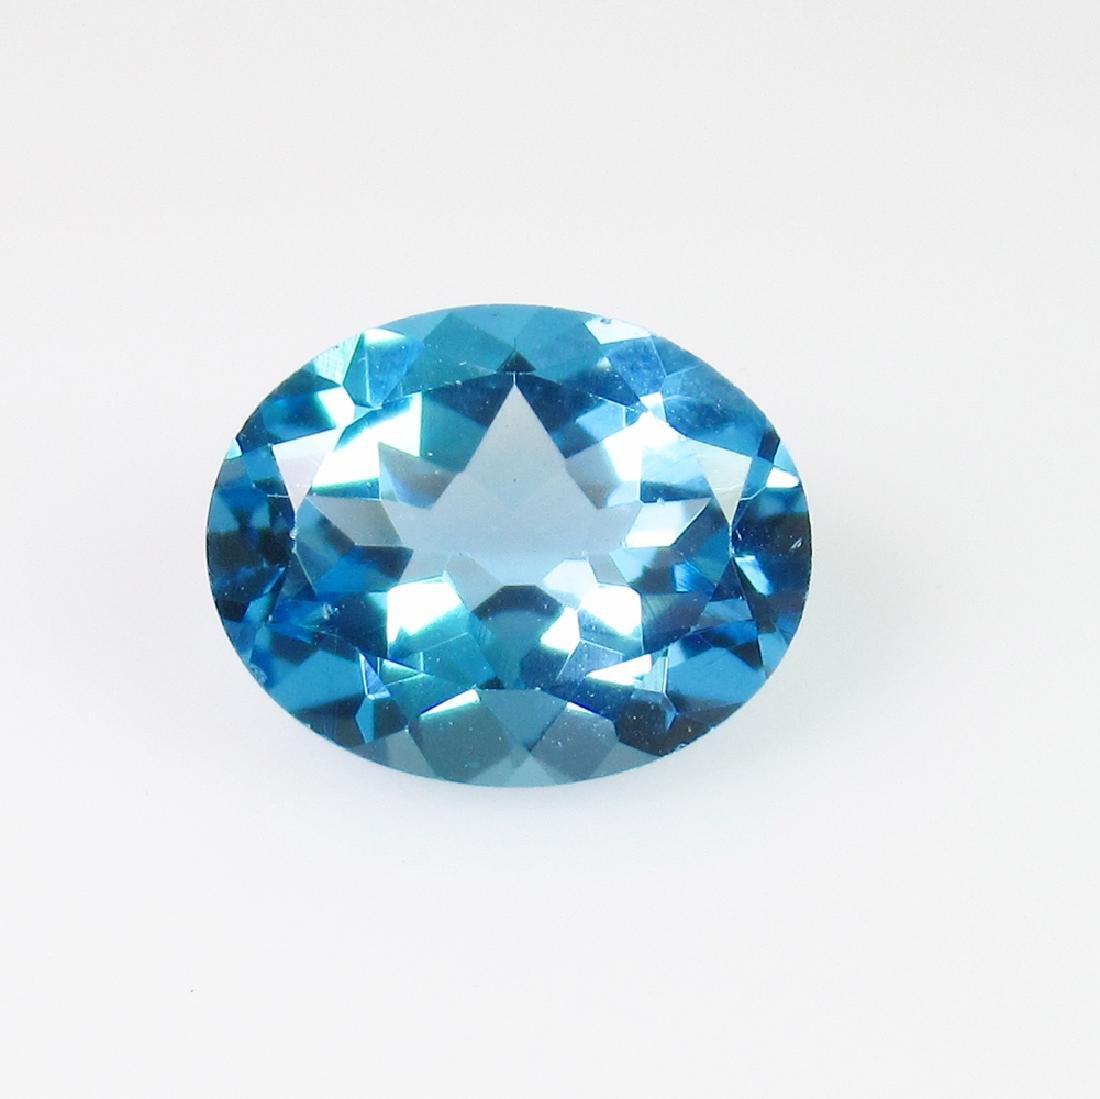 2.96 Ct Genuine Swiss Blue Topaz 10X8 mm Oval Cut